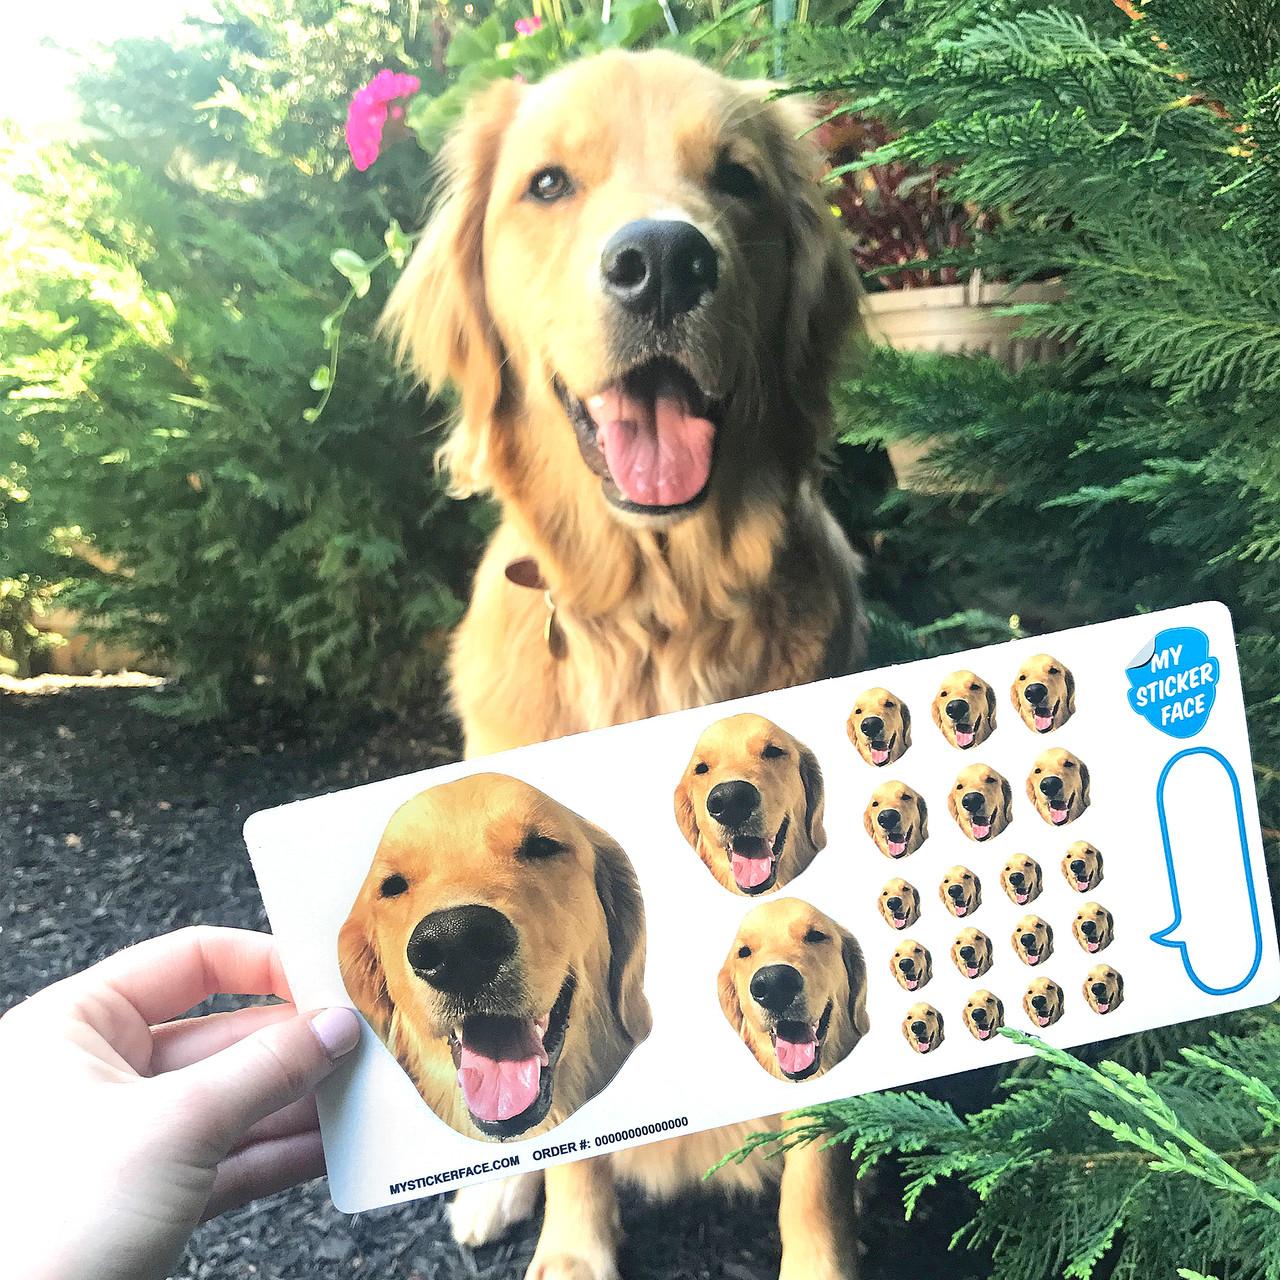 Sampler Face Sticker Sheet - 3 Pack